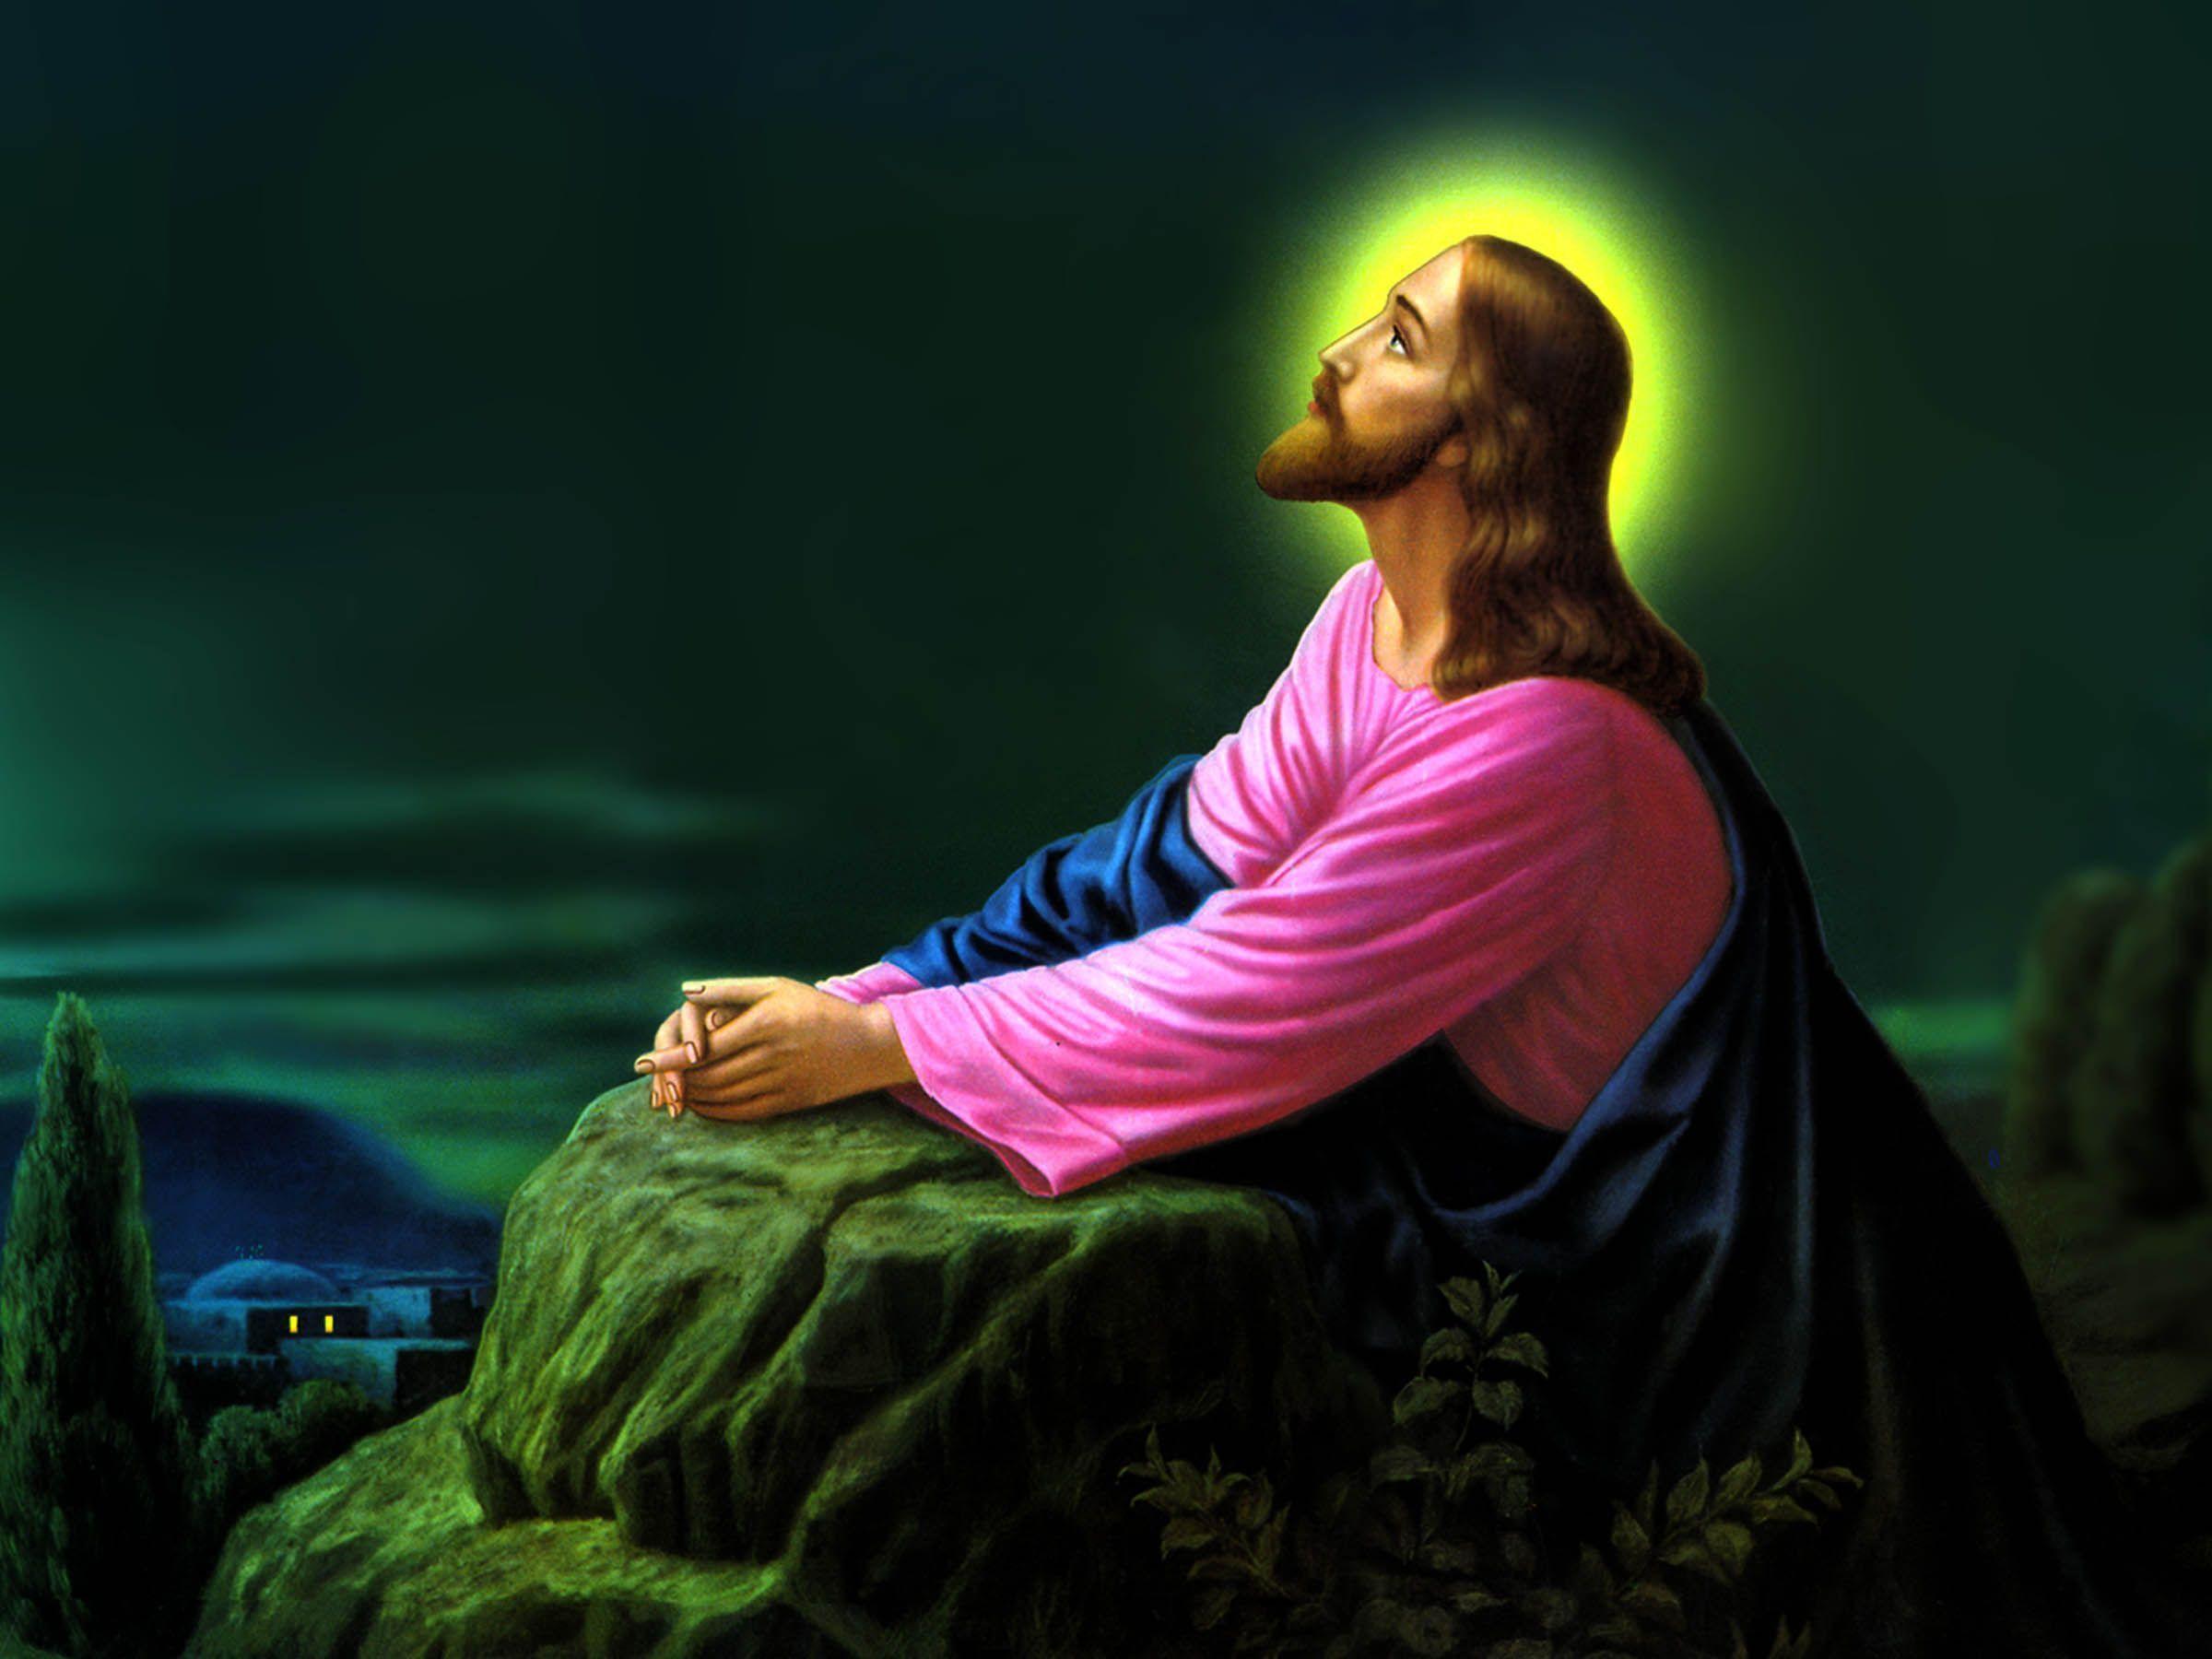 Jesus Hd Wallpapers Wallpaper Cave